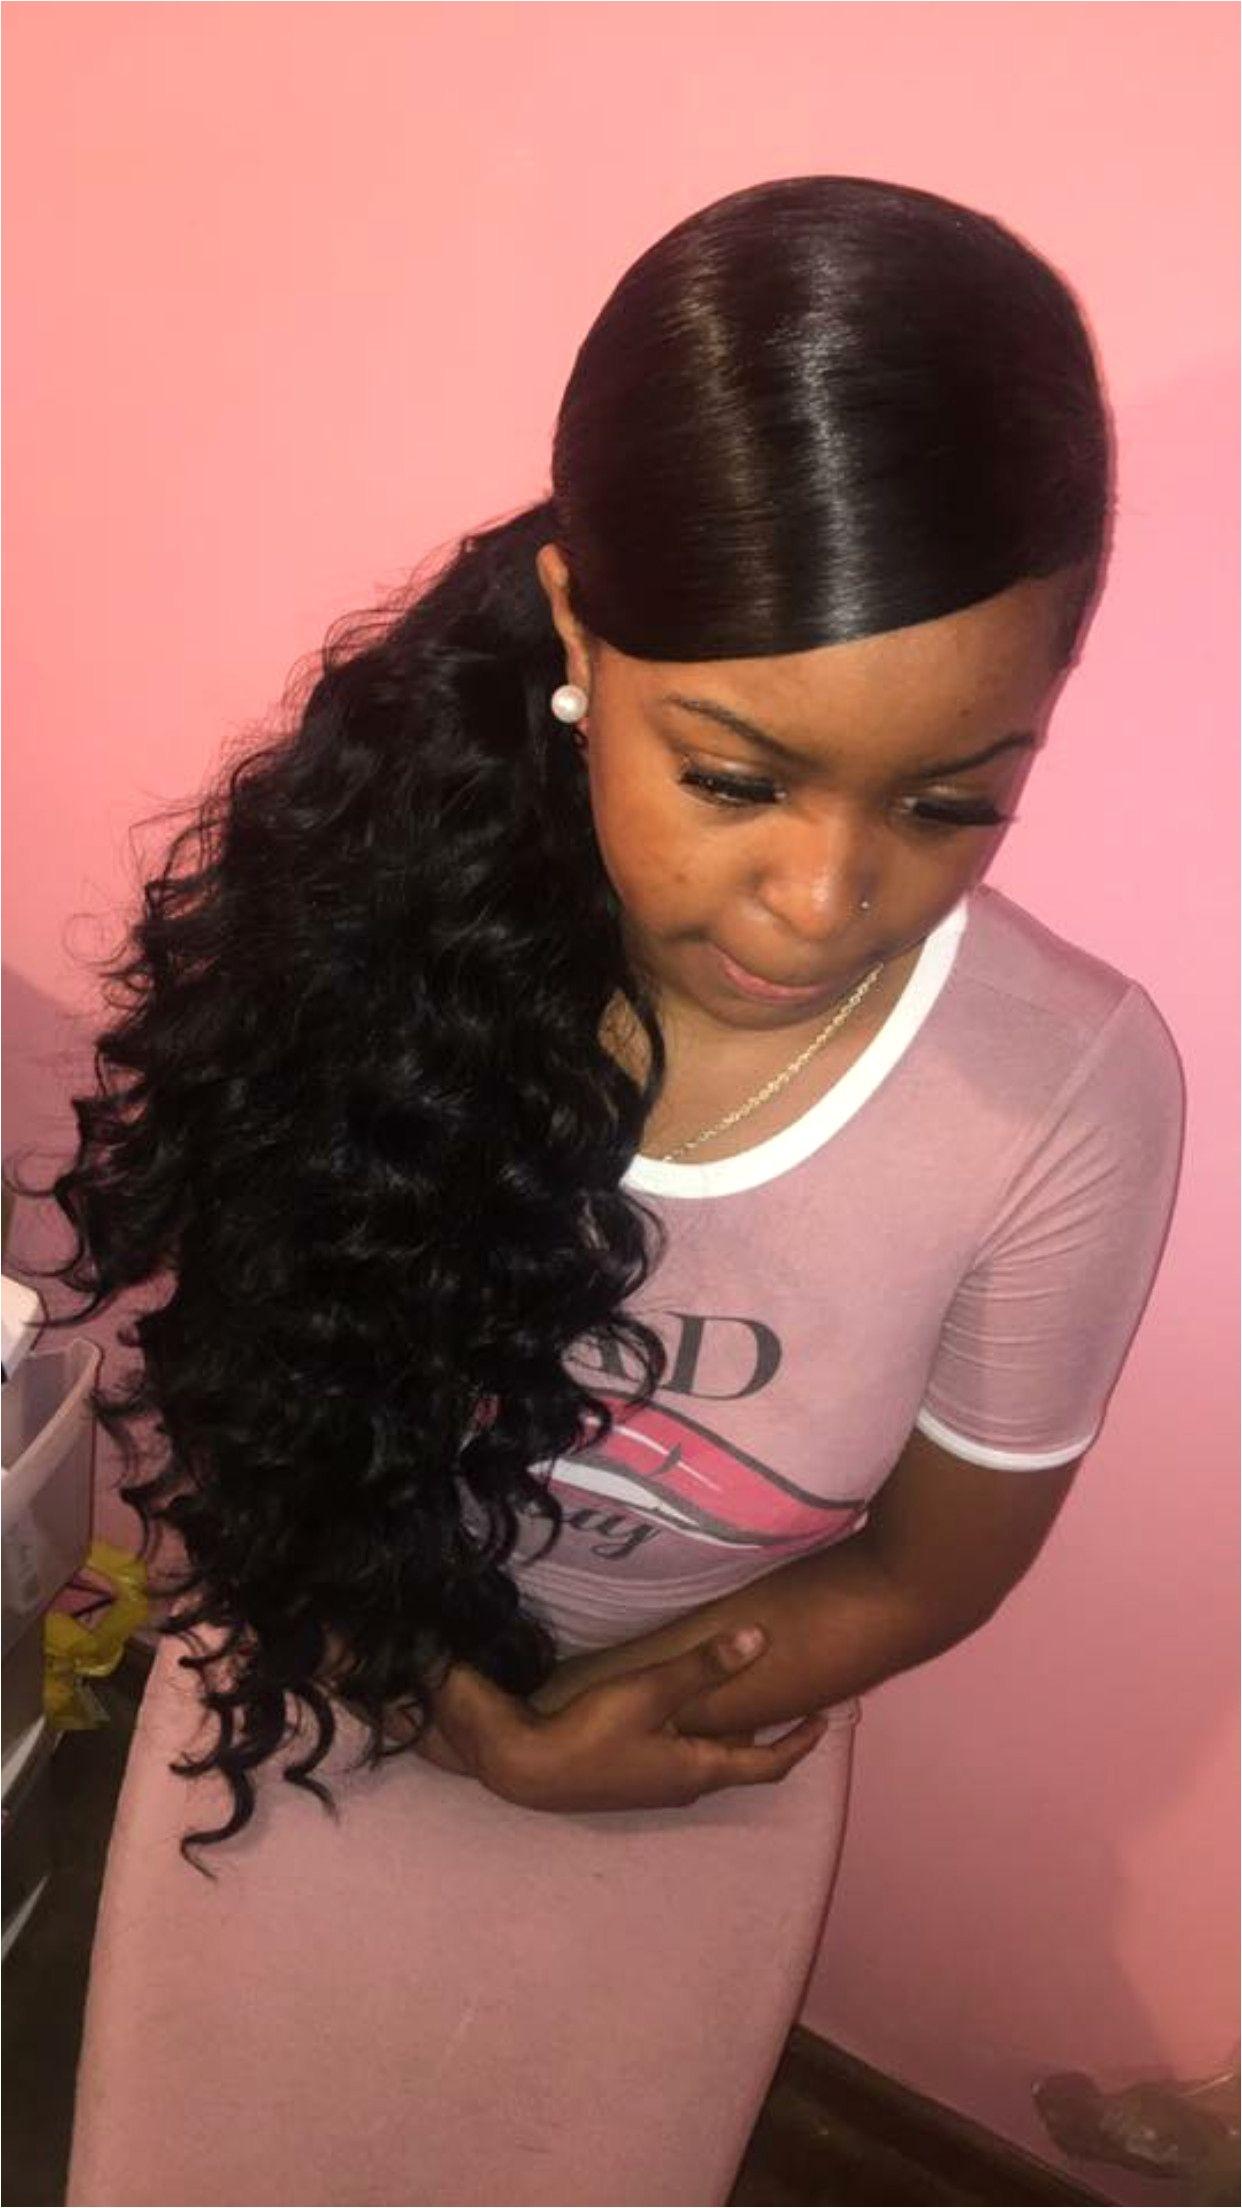 Short Hair Cut Women Inspirational Flat Iron Hairstyles for Medium Hair Awesome Short Hairstyles Black